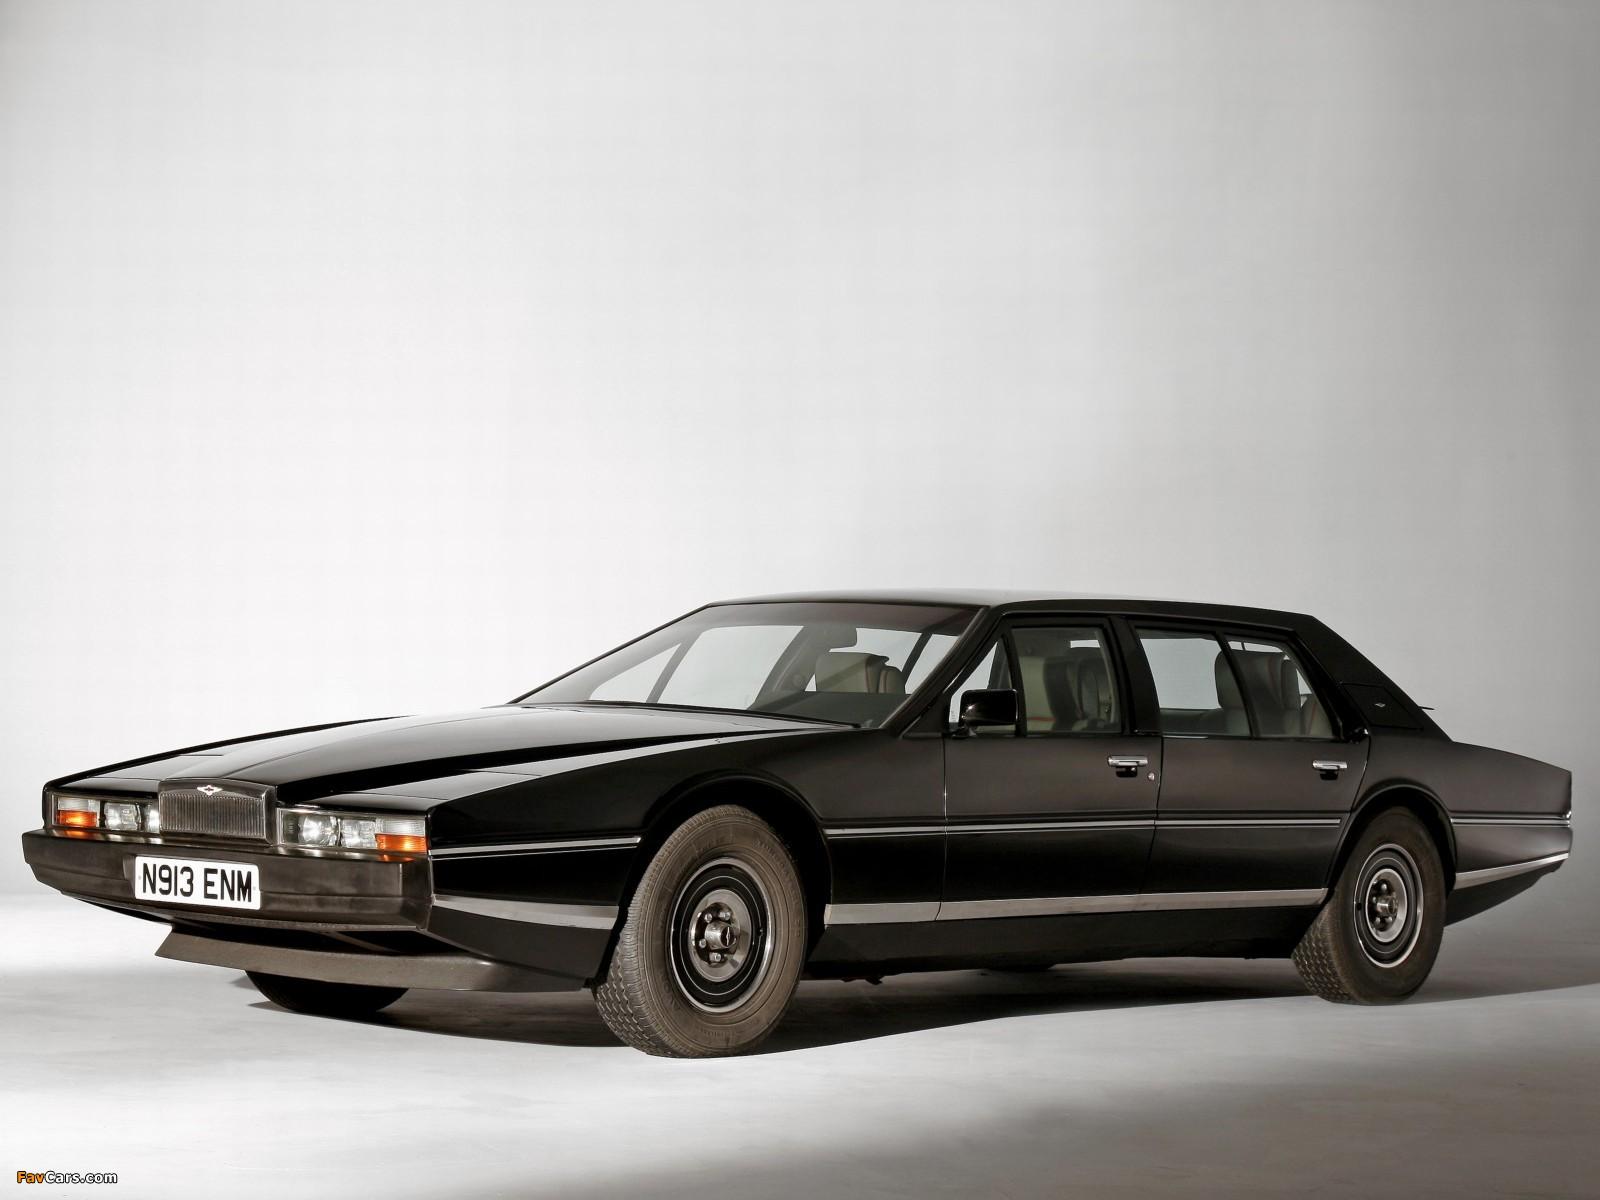 Image Result For Aston Martin Lagonda Tickford Limousine